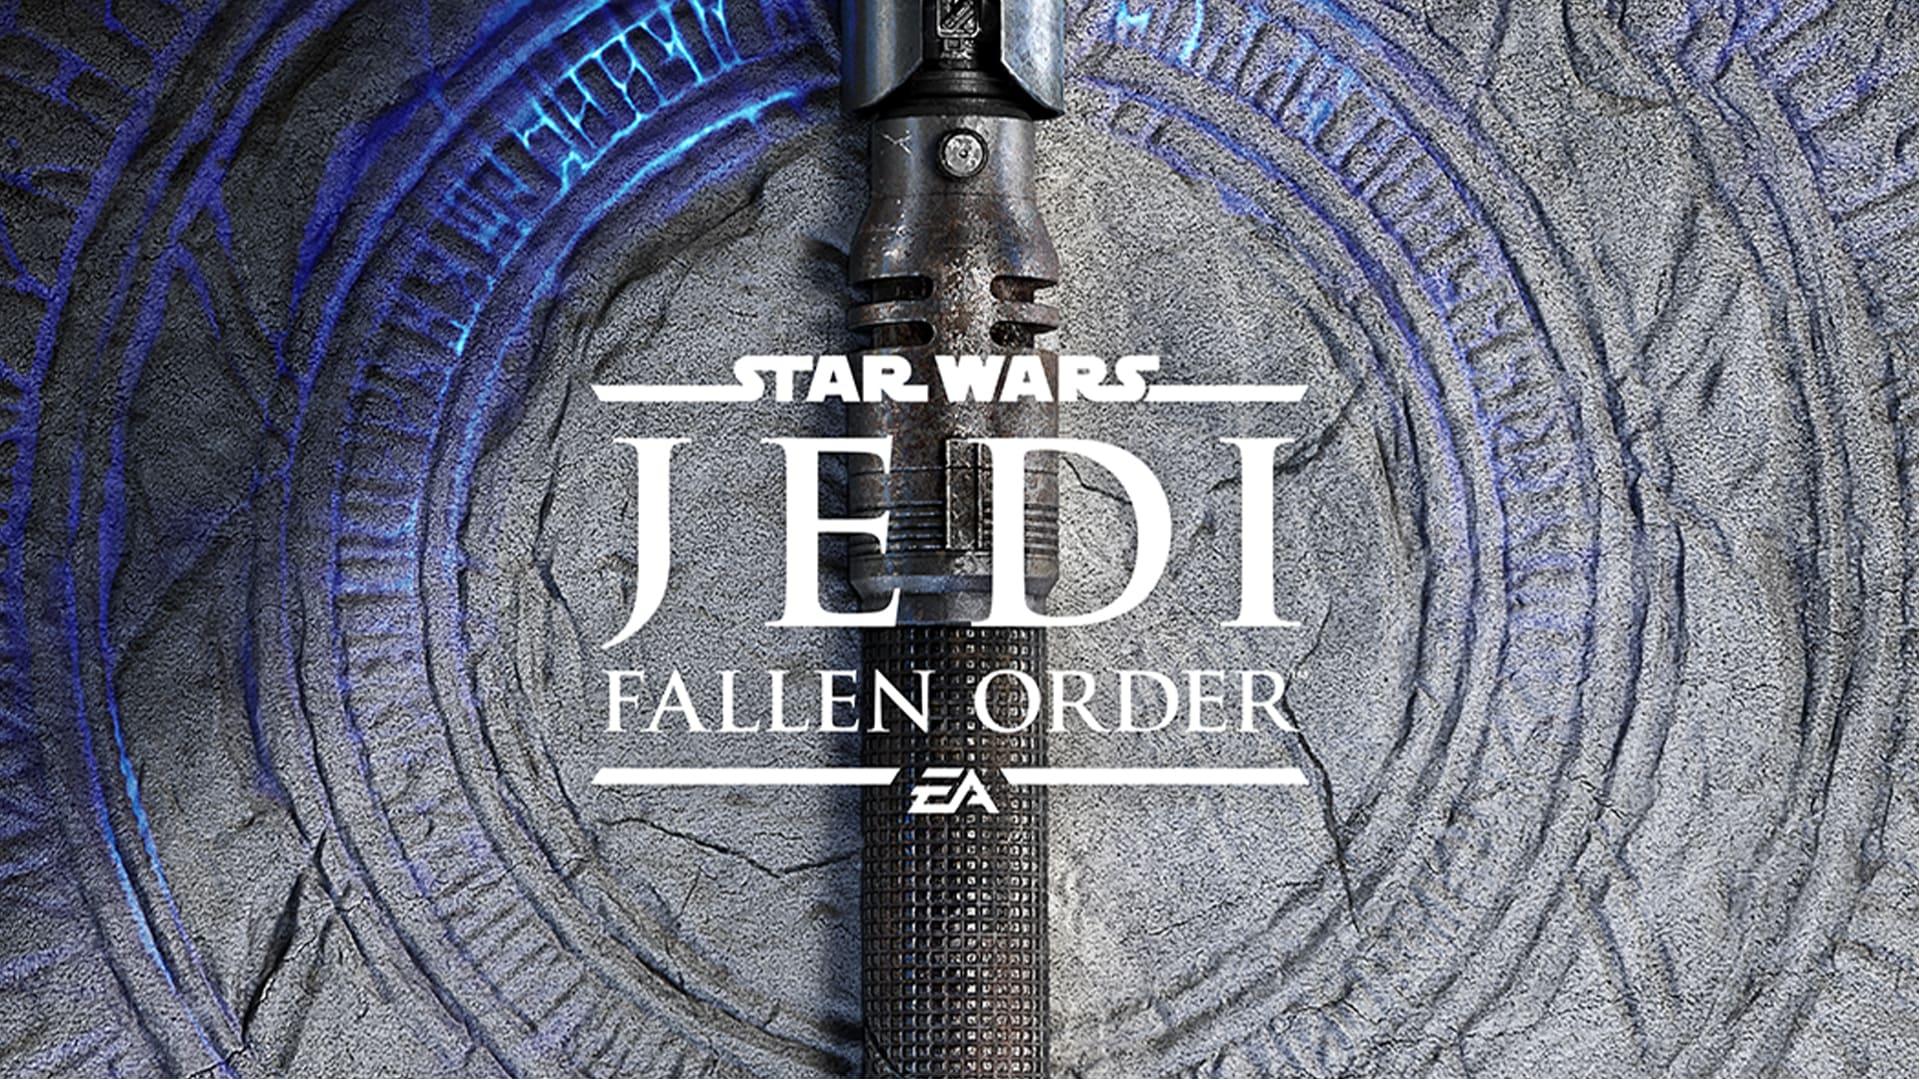 Featuring Star Wars Jedi: Fallen Order art